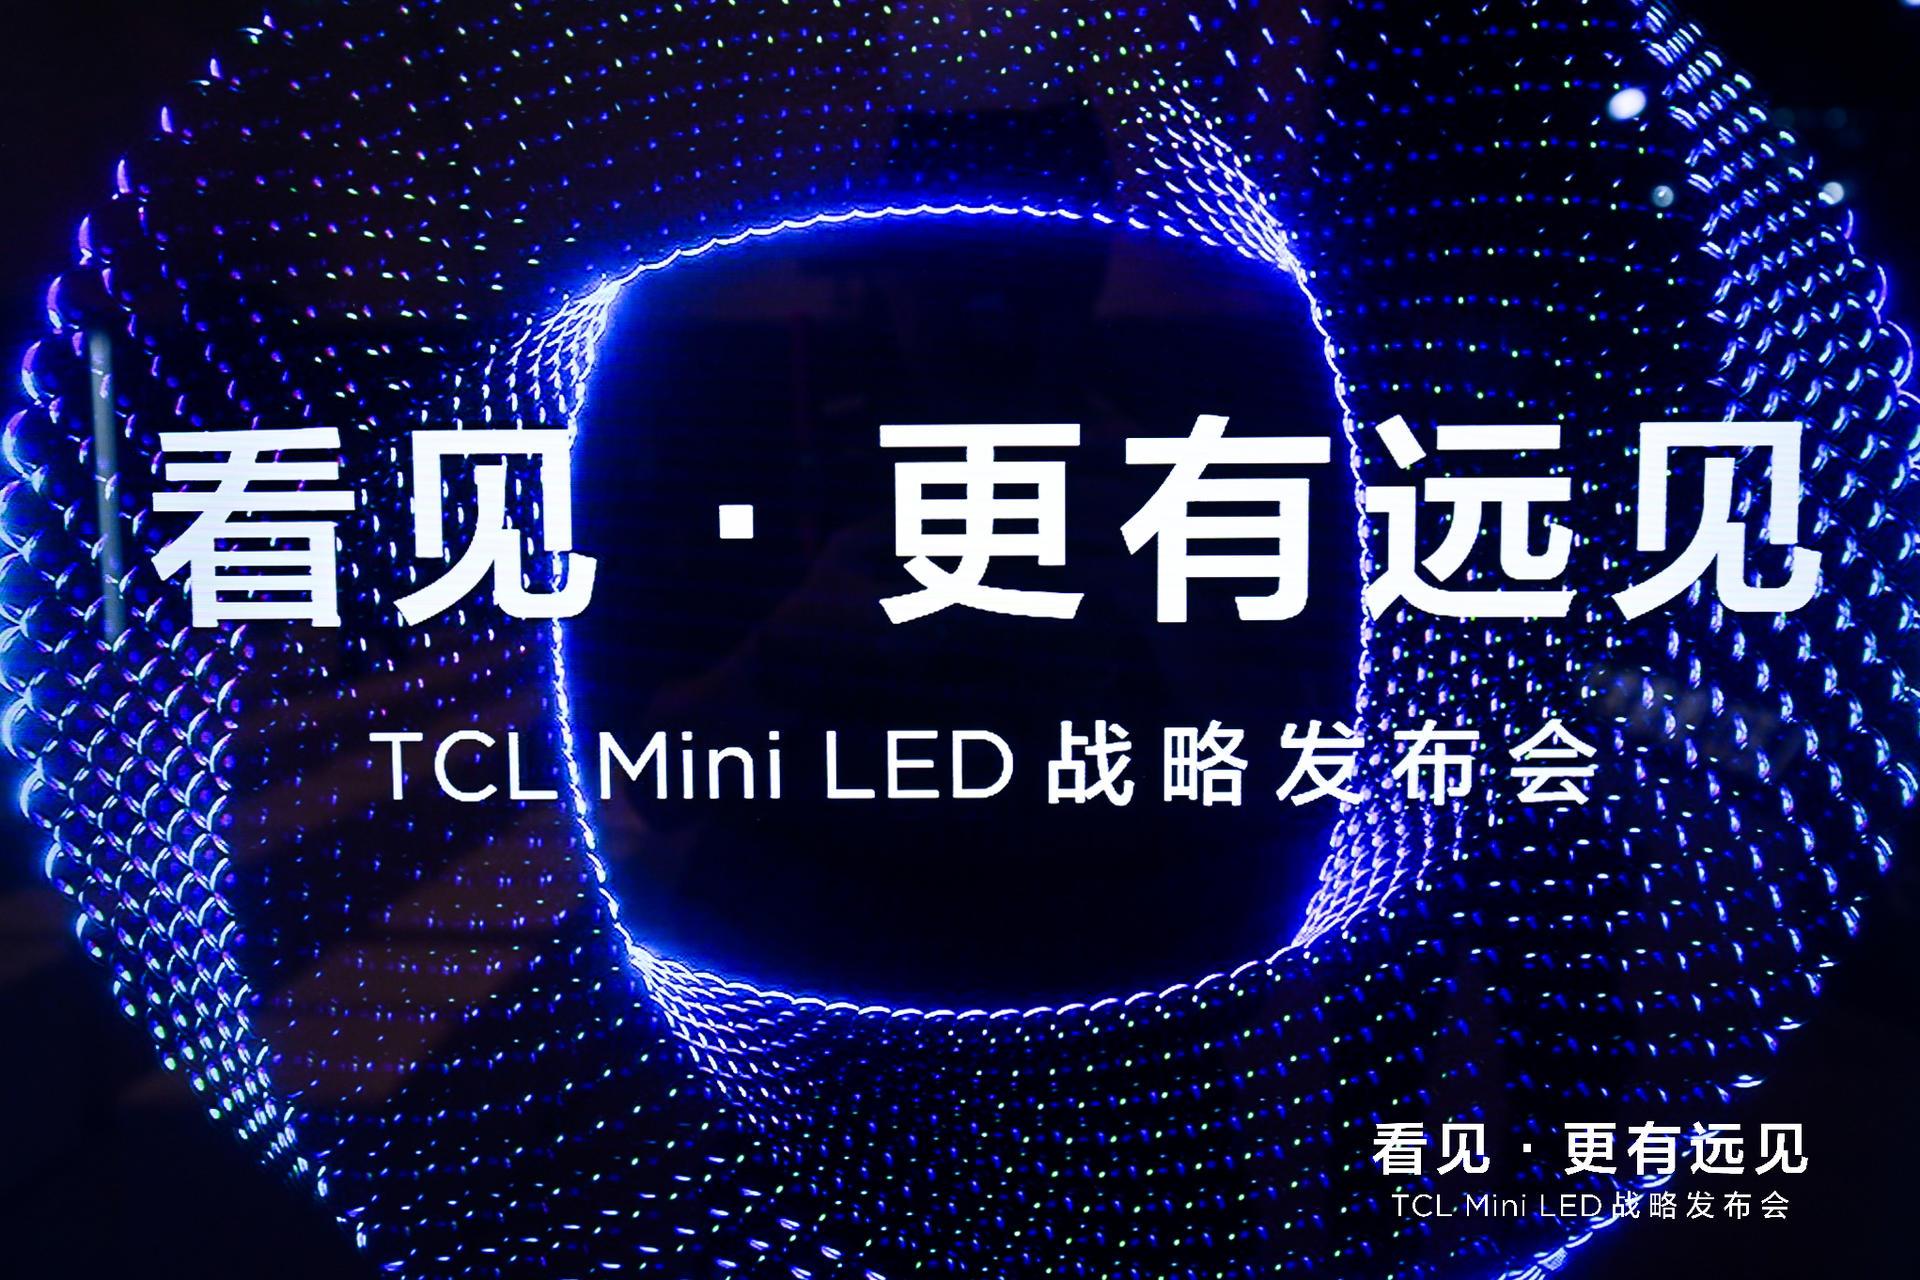 TCL Mini LED战略发布会活动策划全面开启大屏显示的新纪元